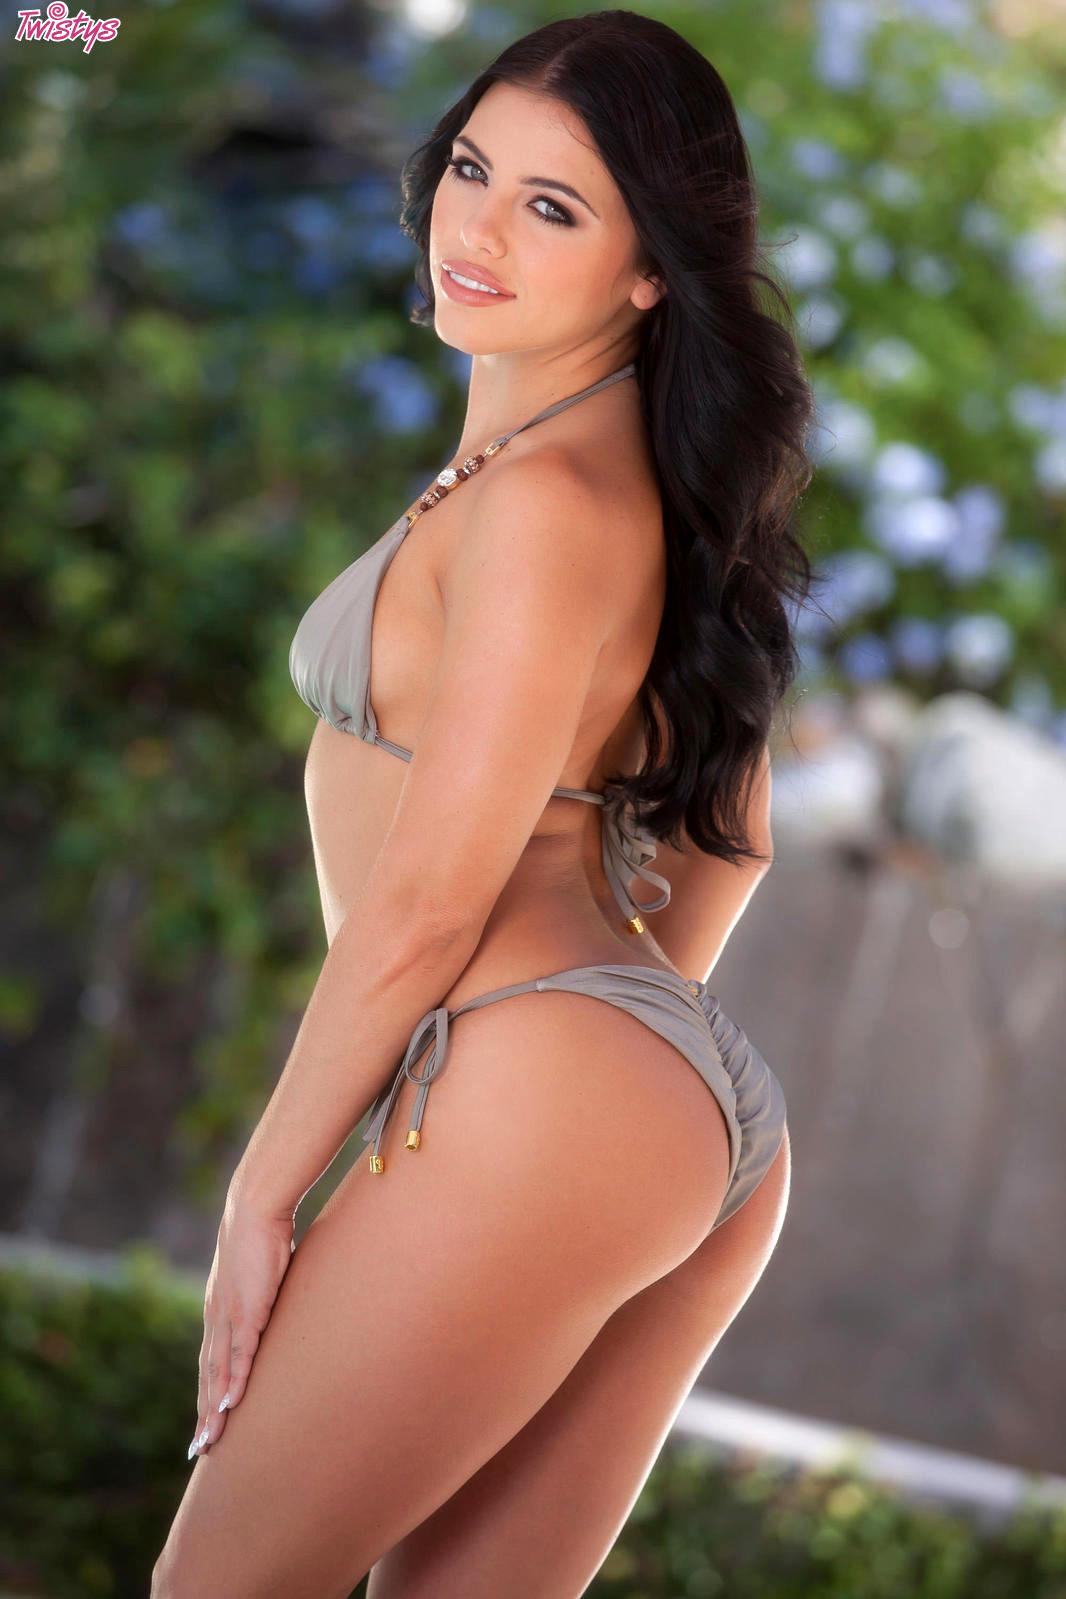 Adriana Checik